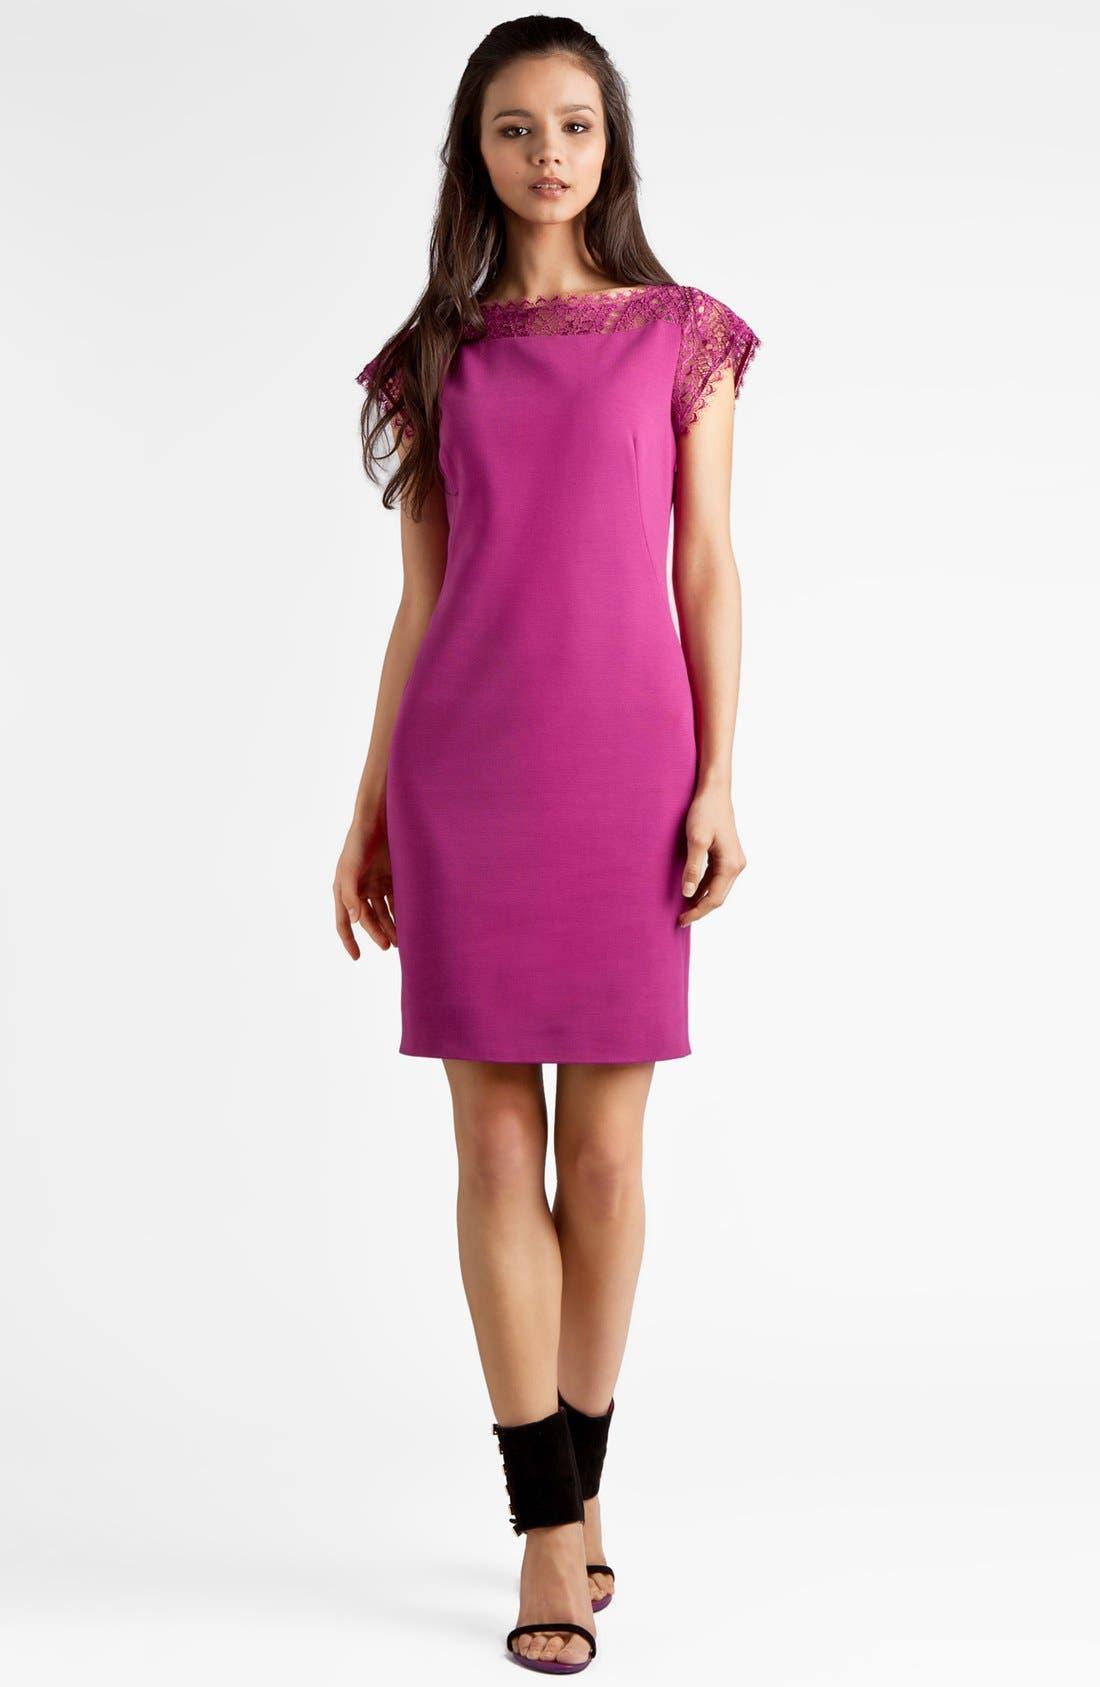 Main Image - Emilio Pucci Lace Detail Punto Milano Dress